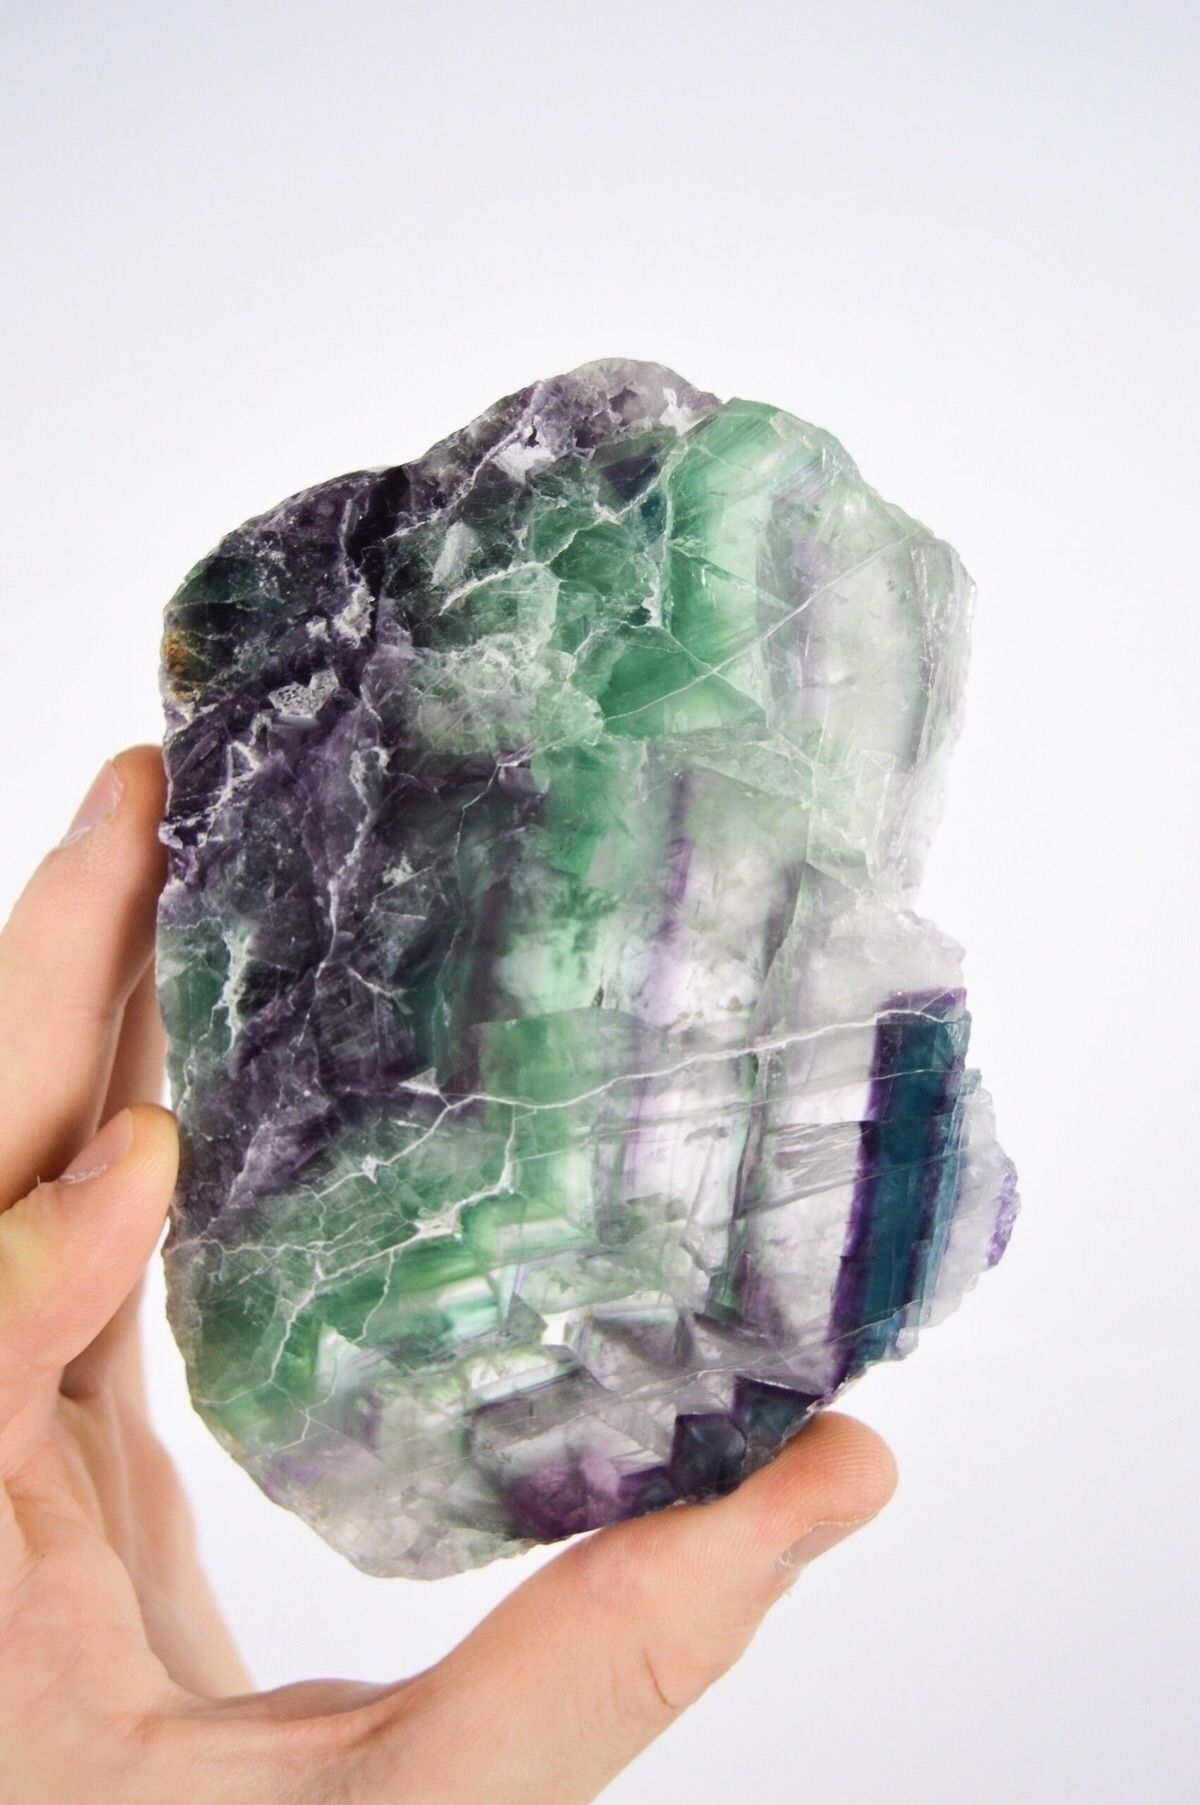 :green_heart::blue_heart::purpl - earthboundcrystals | ello